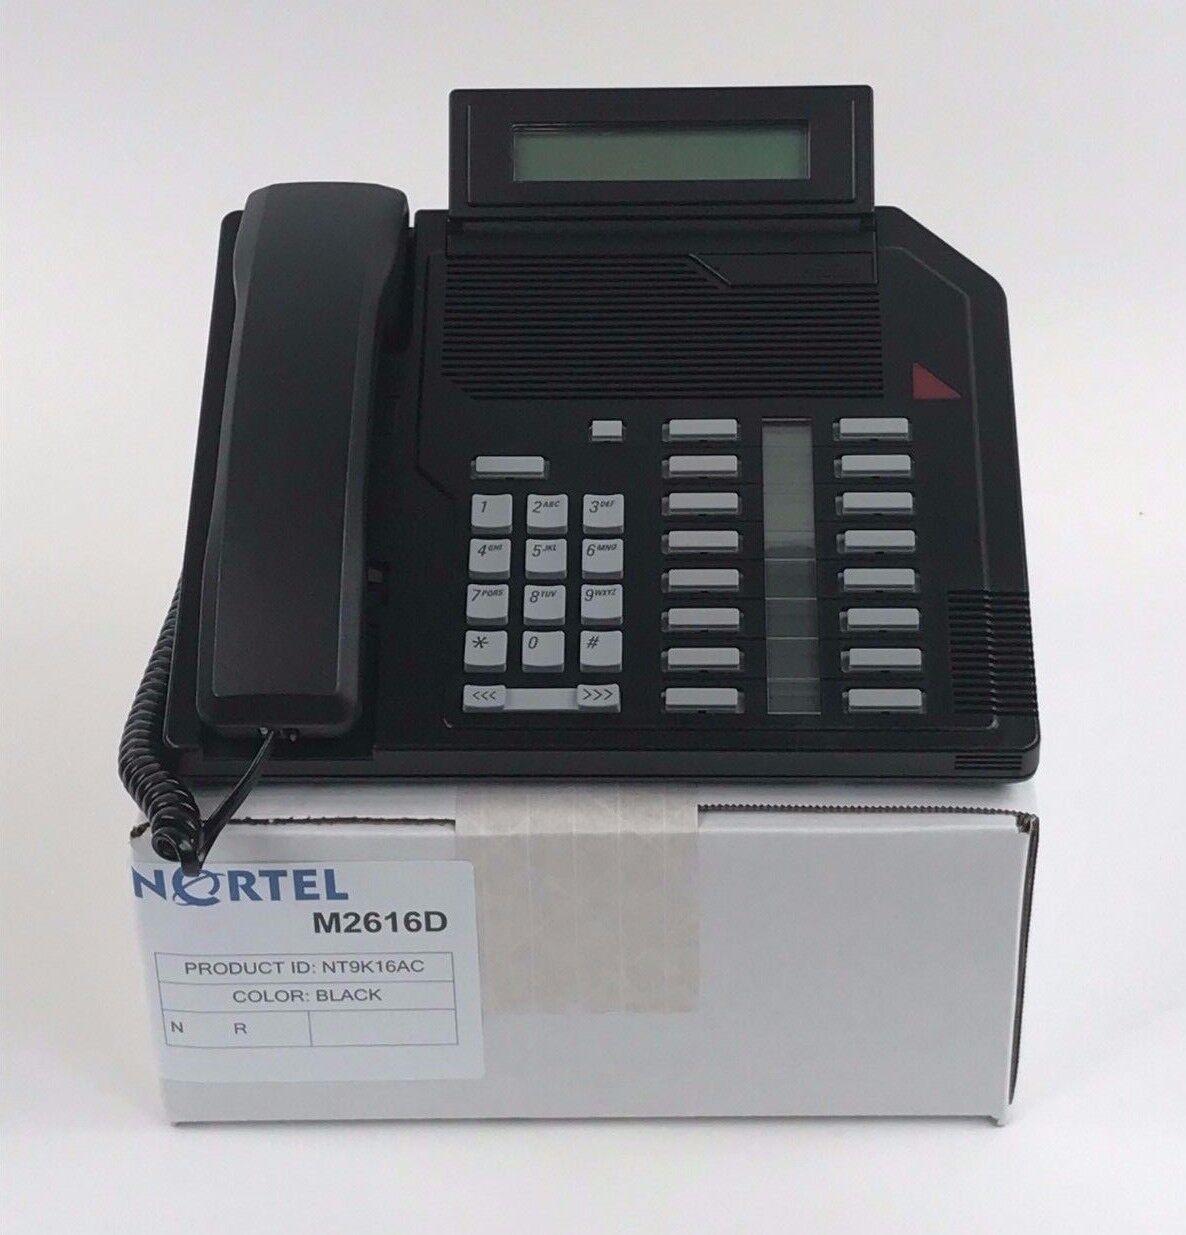 Black Refurbished Nortel Meridian NTZK16BA M2616D 16-Button Digital Speaker